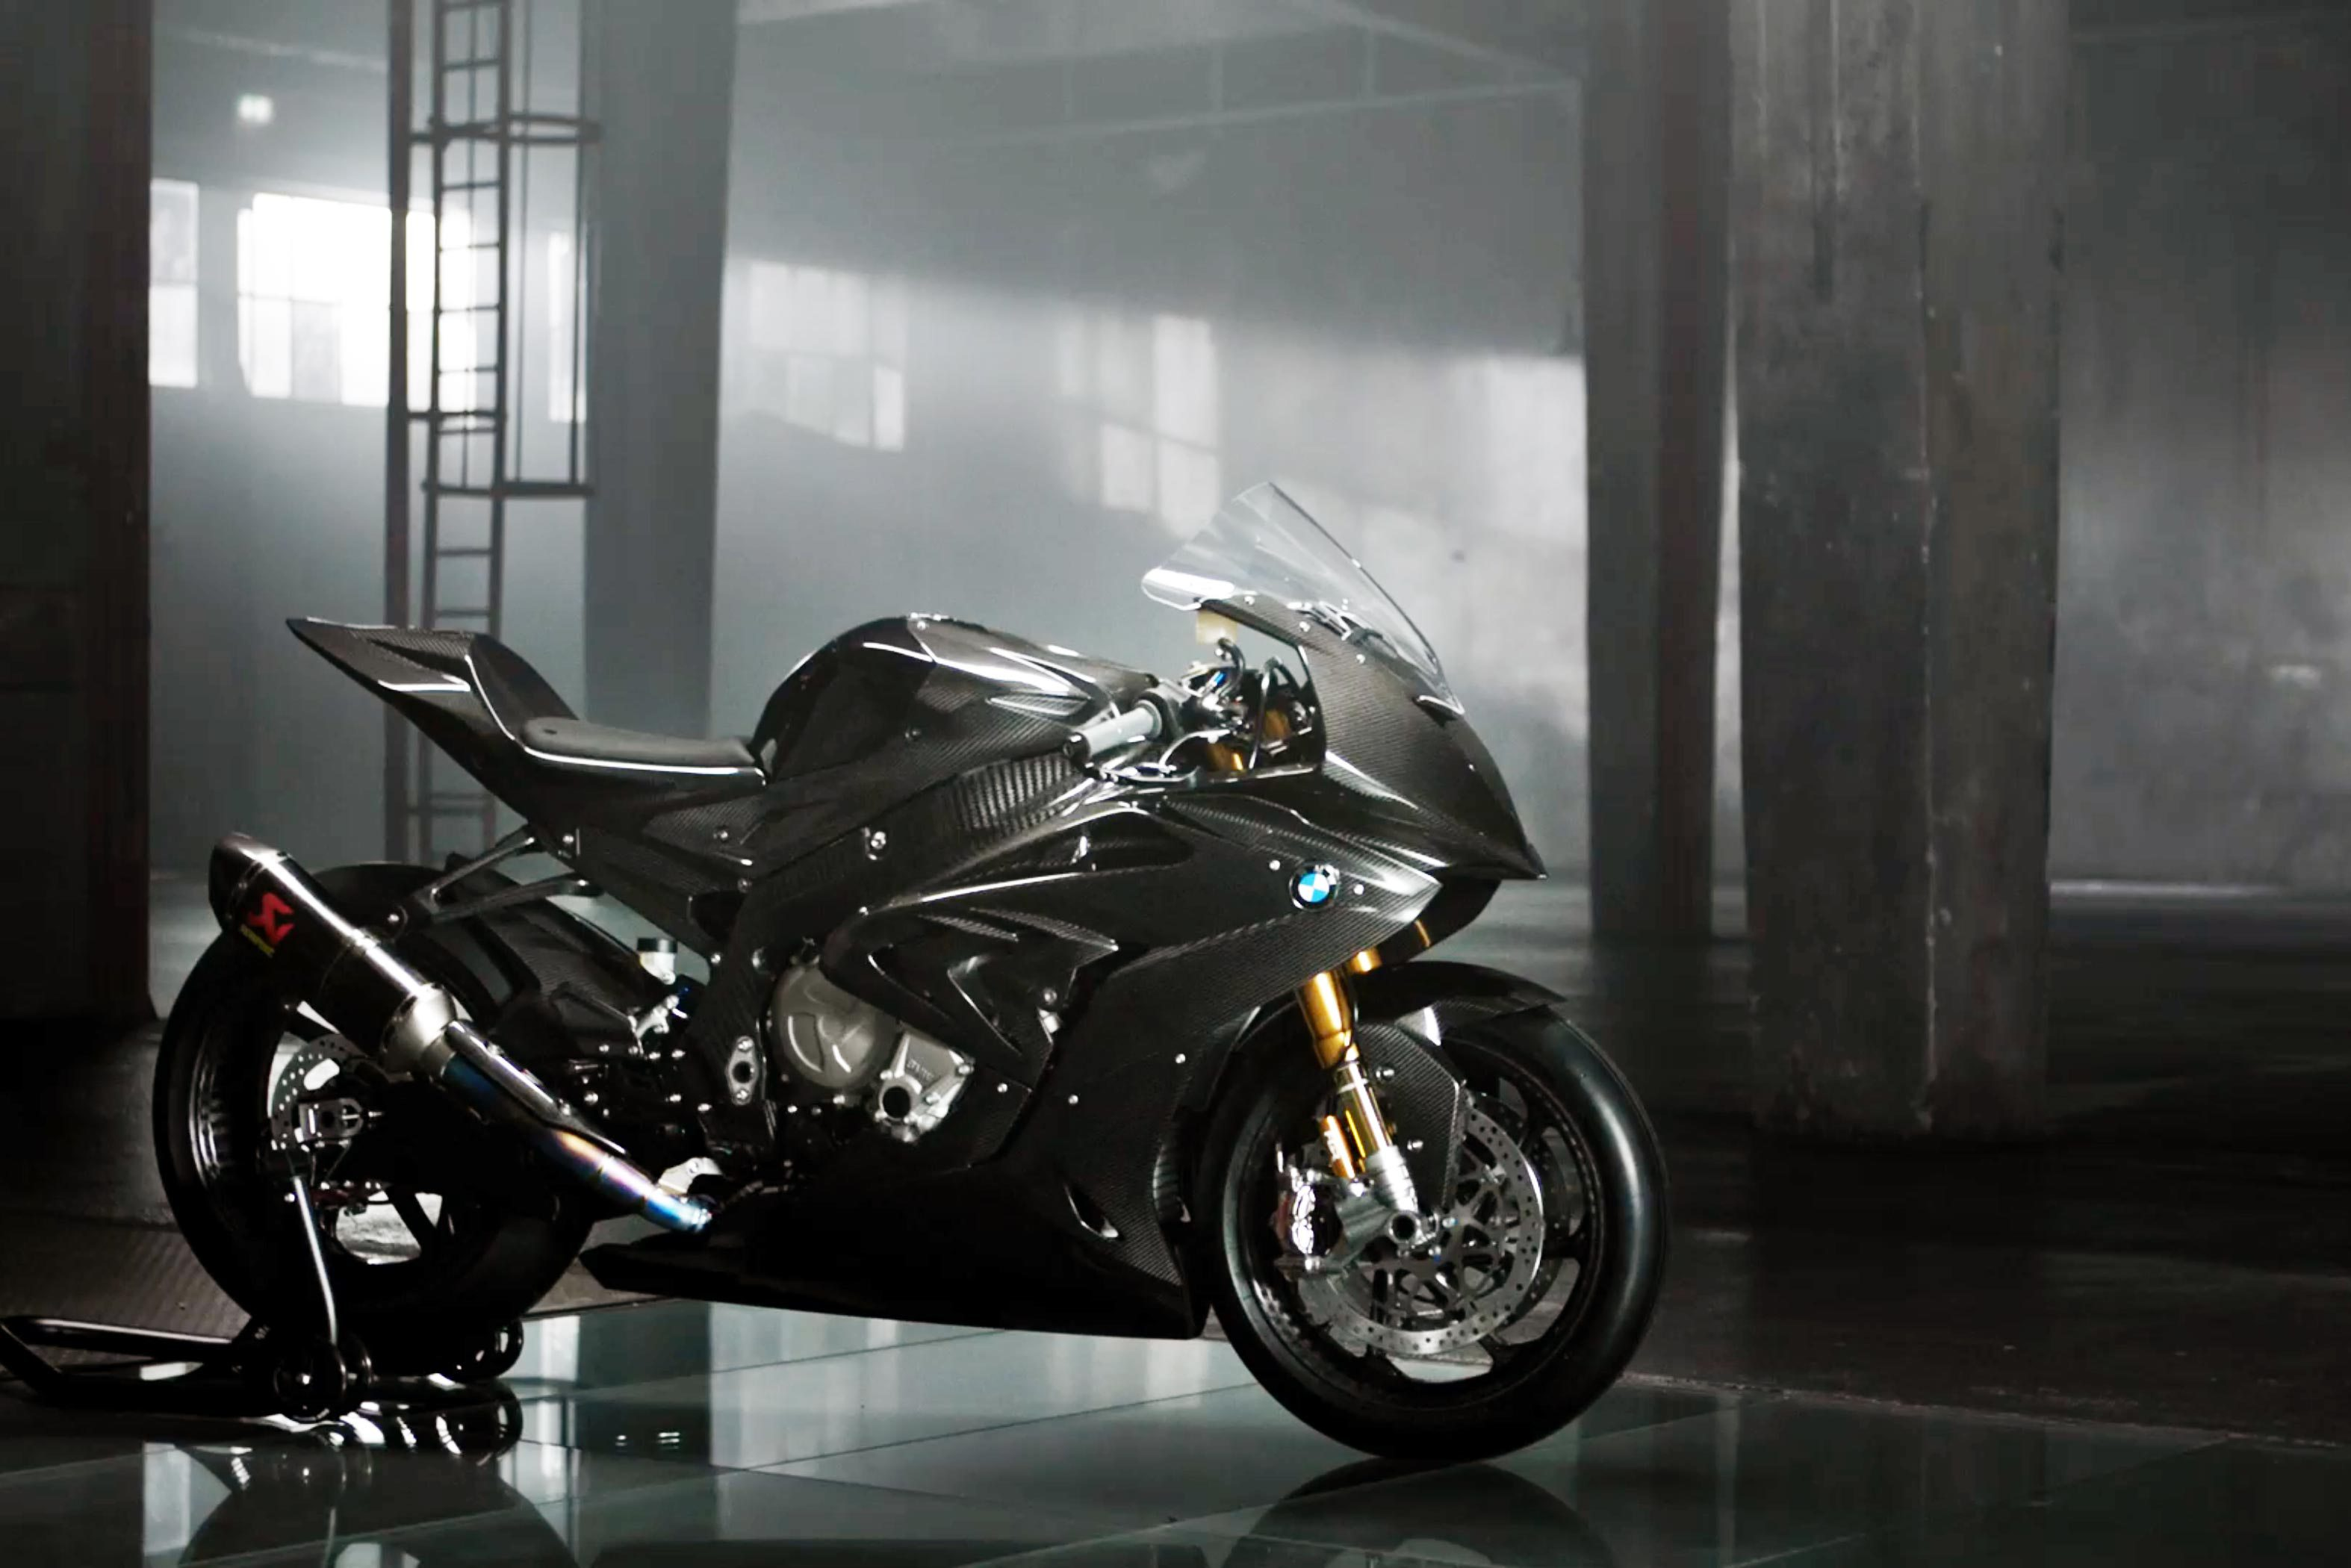 Bmw Hp4 Race Carbon Fiber Superbike A Closer Look Drivemag Riders